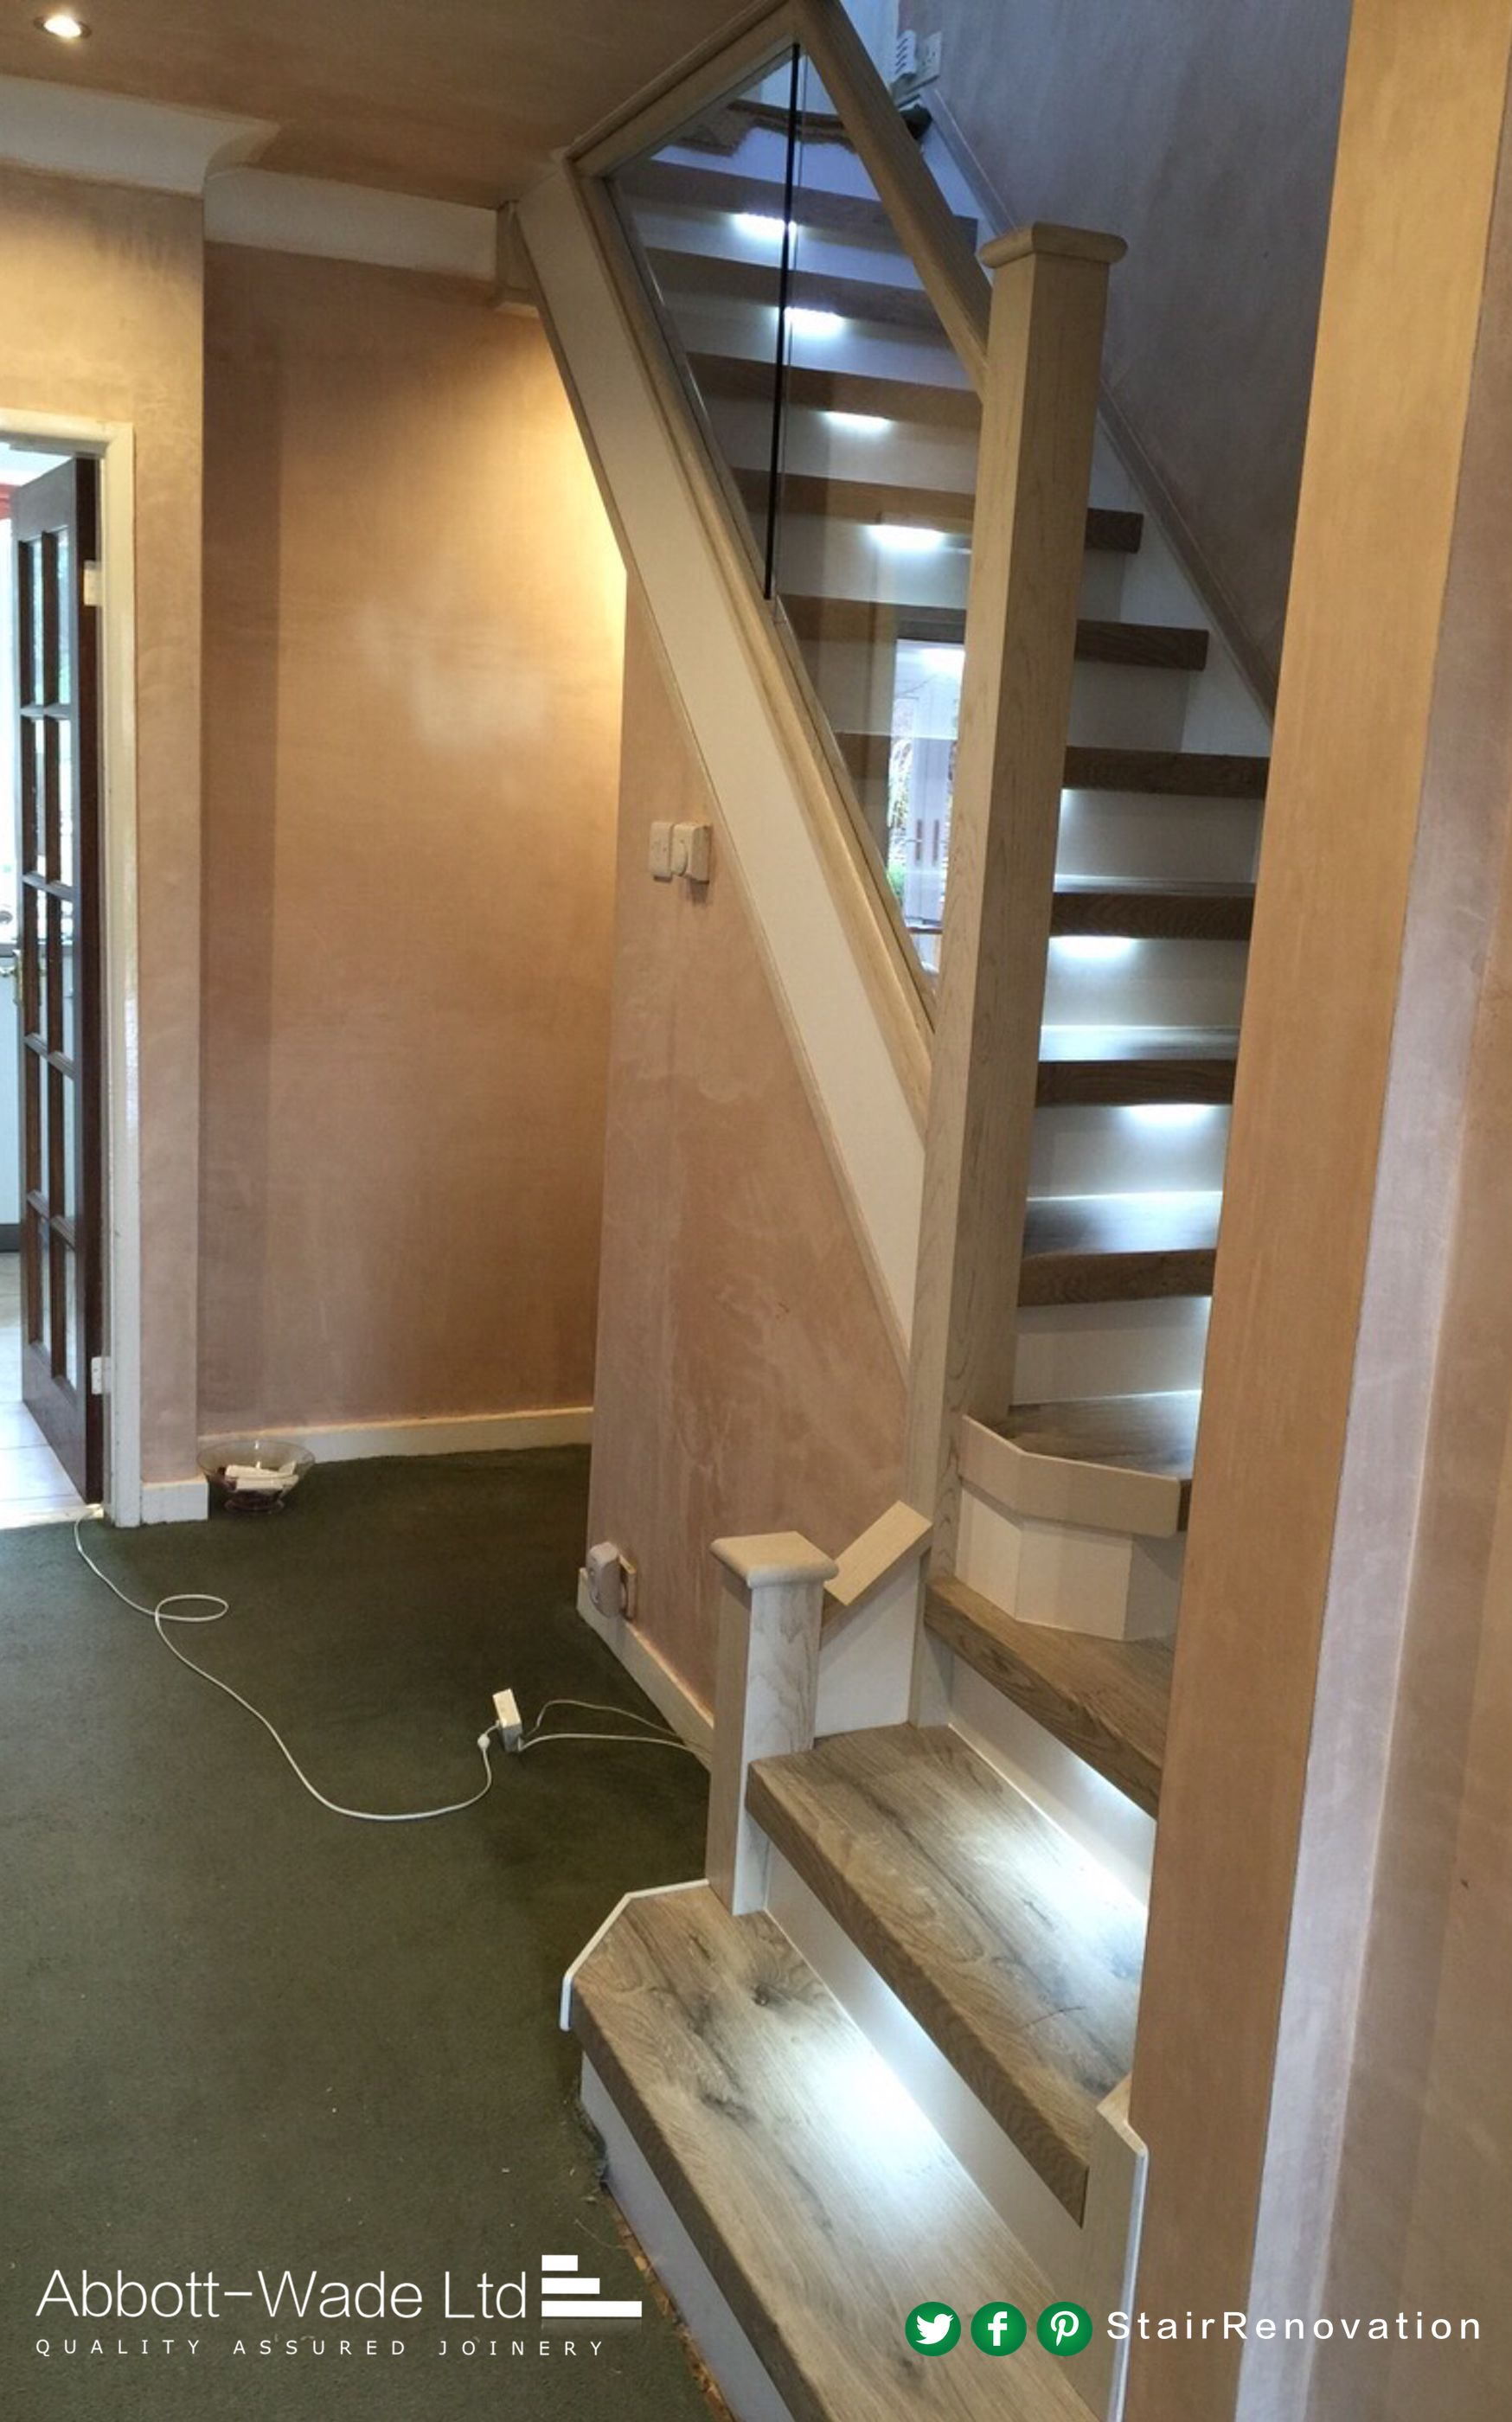 Staircase in Arlington Oak with white riser built in lights & glass balustrade